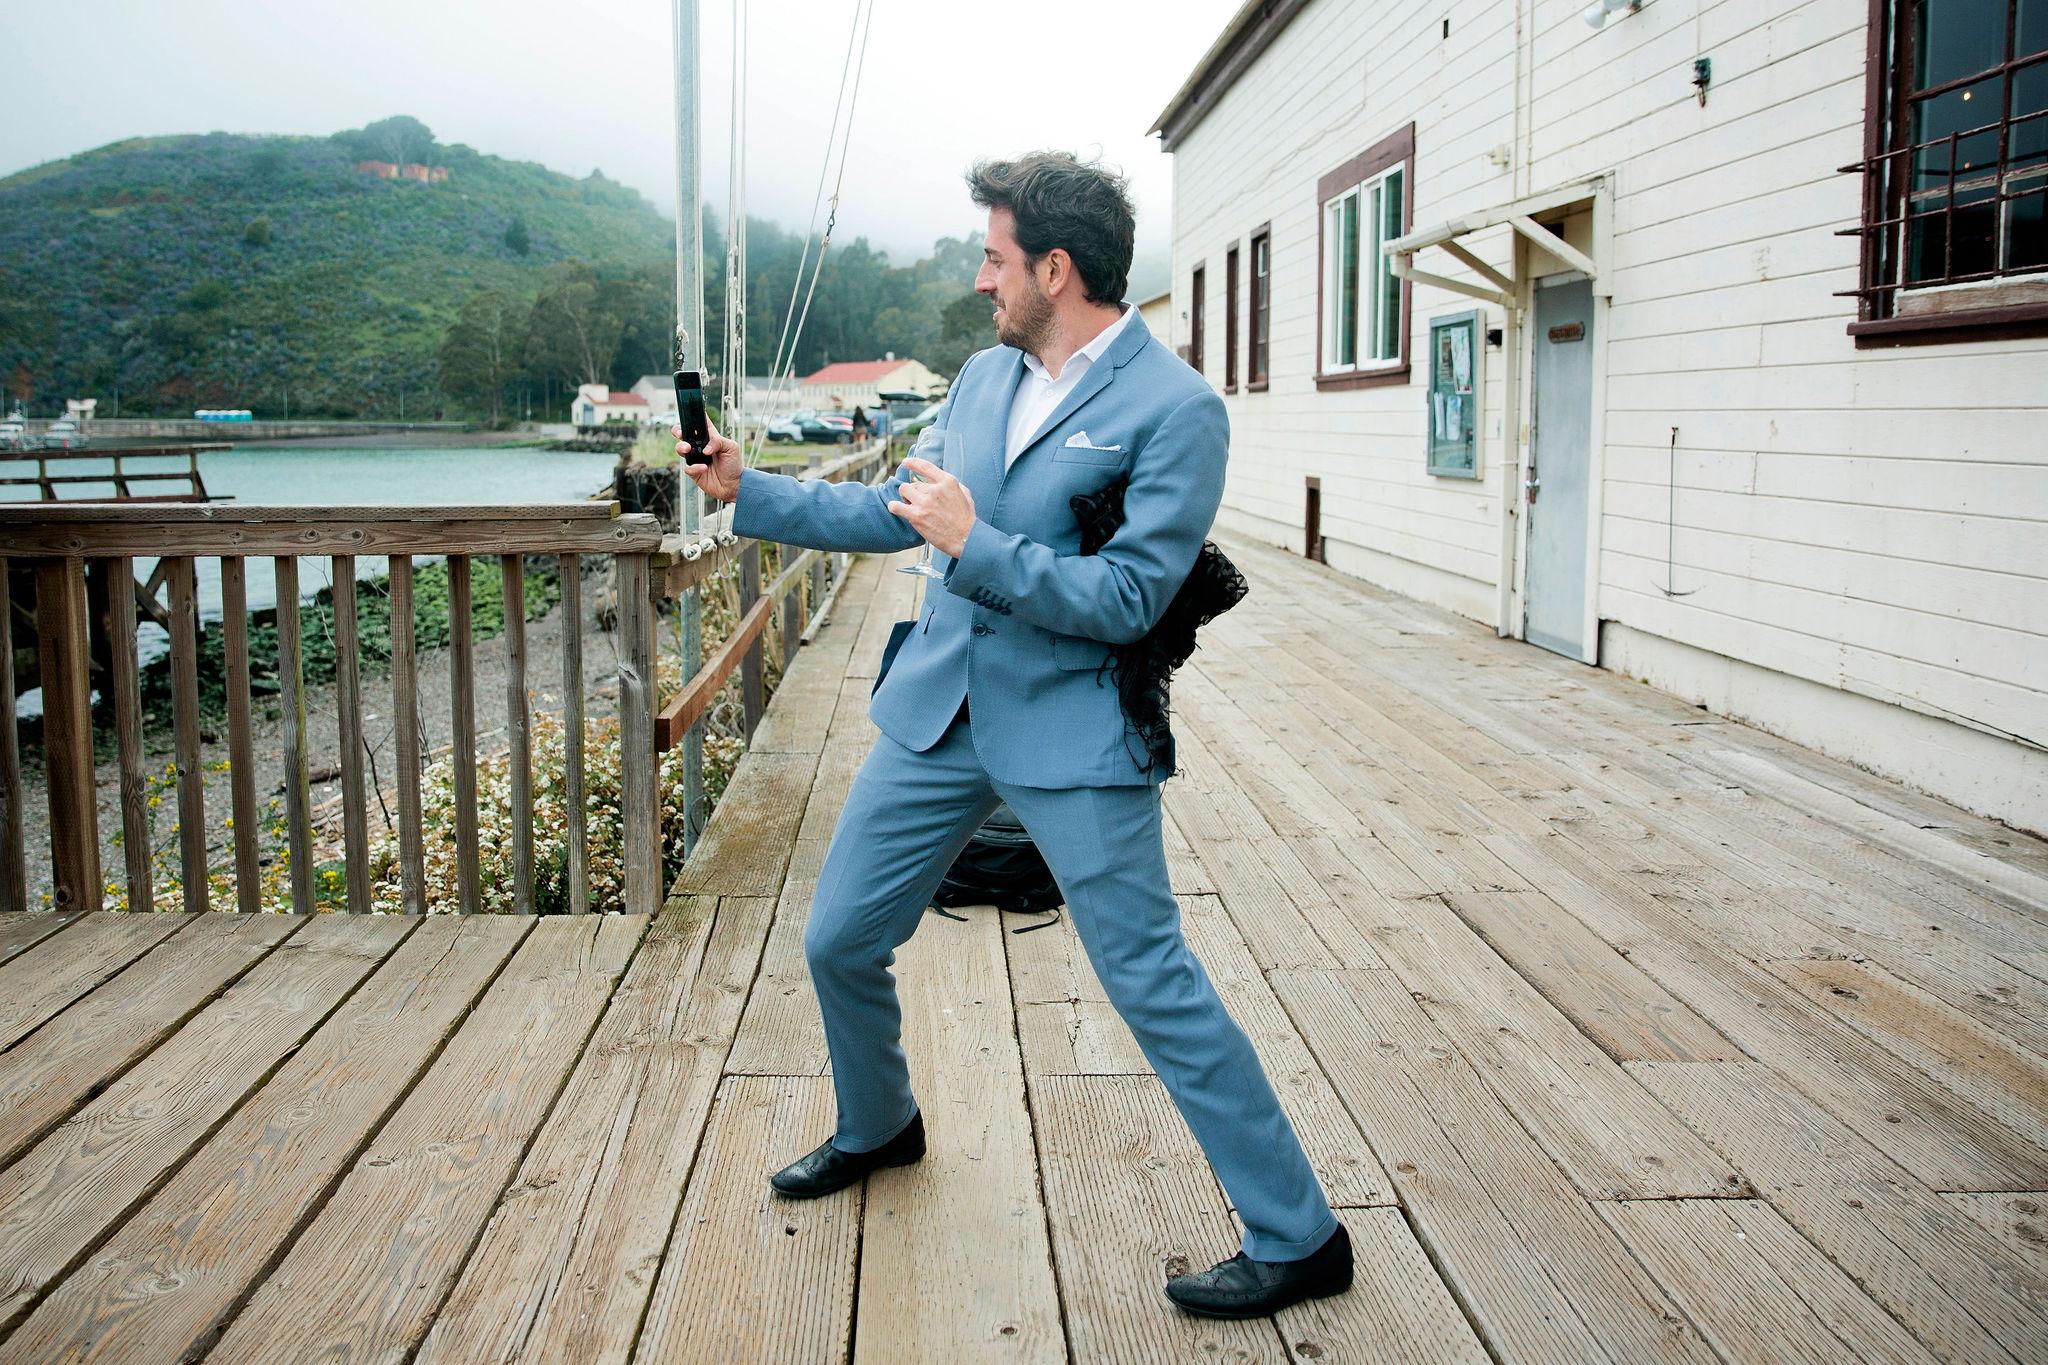 Presidio-Yacht-Club-Wedding-067.JPG